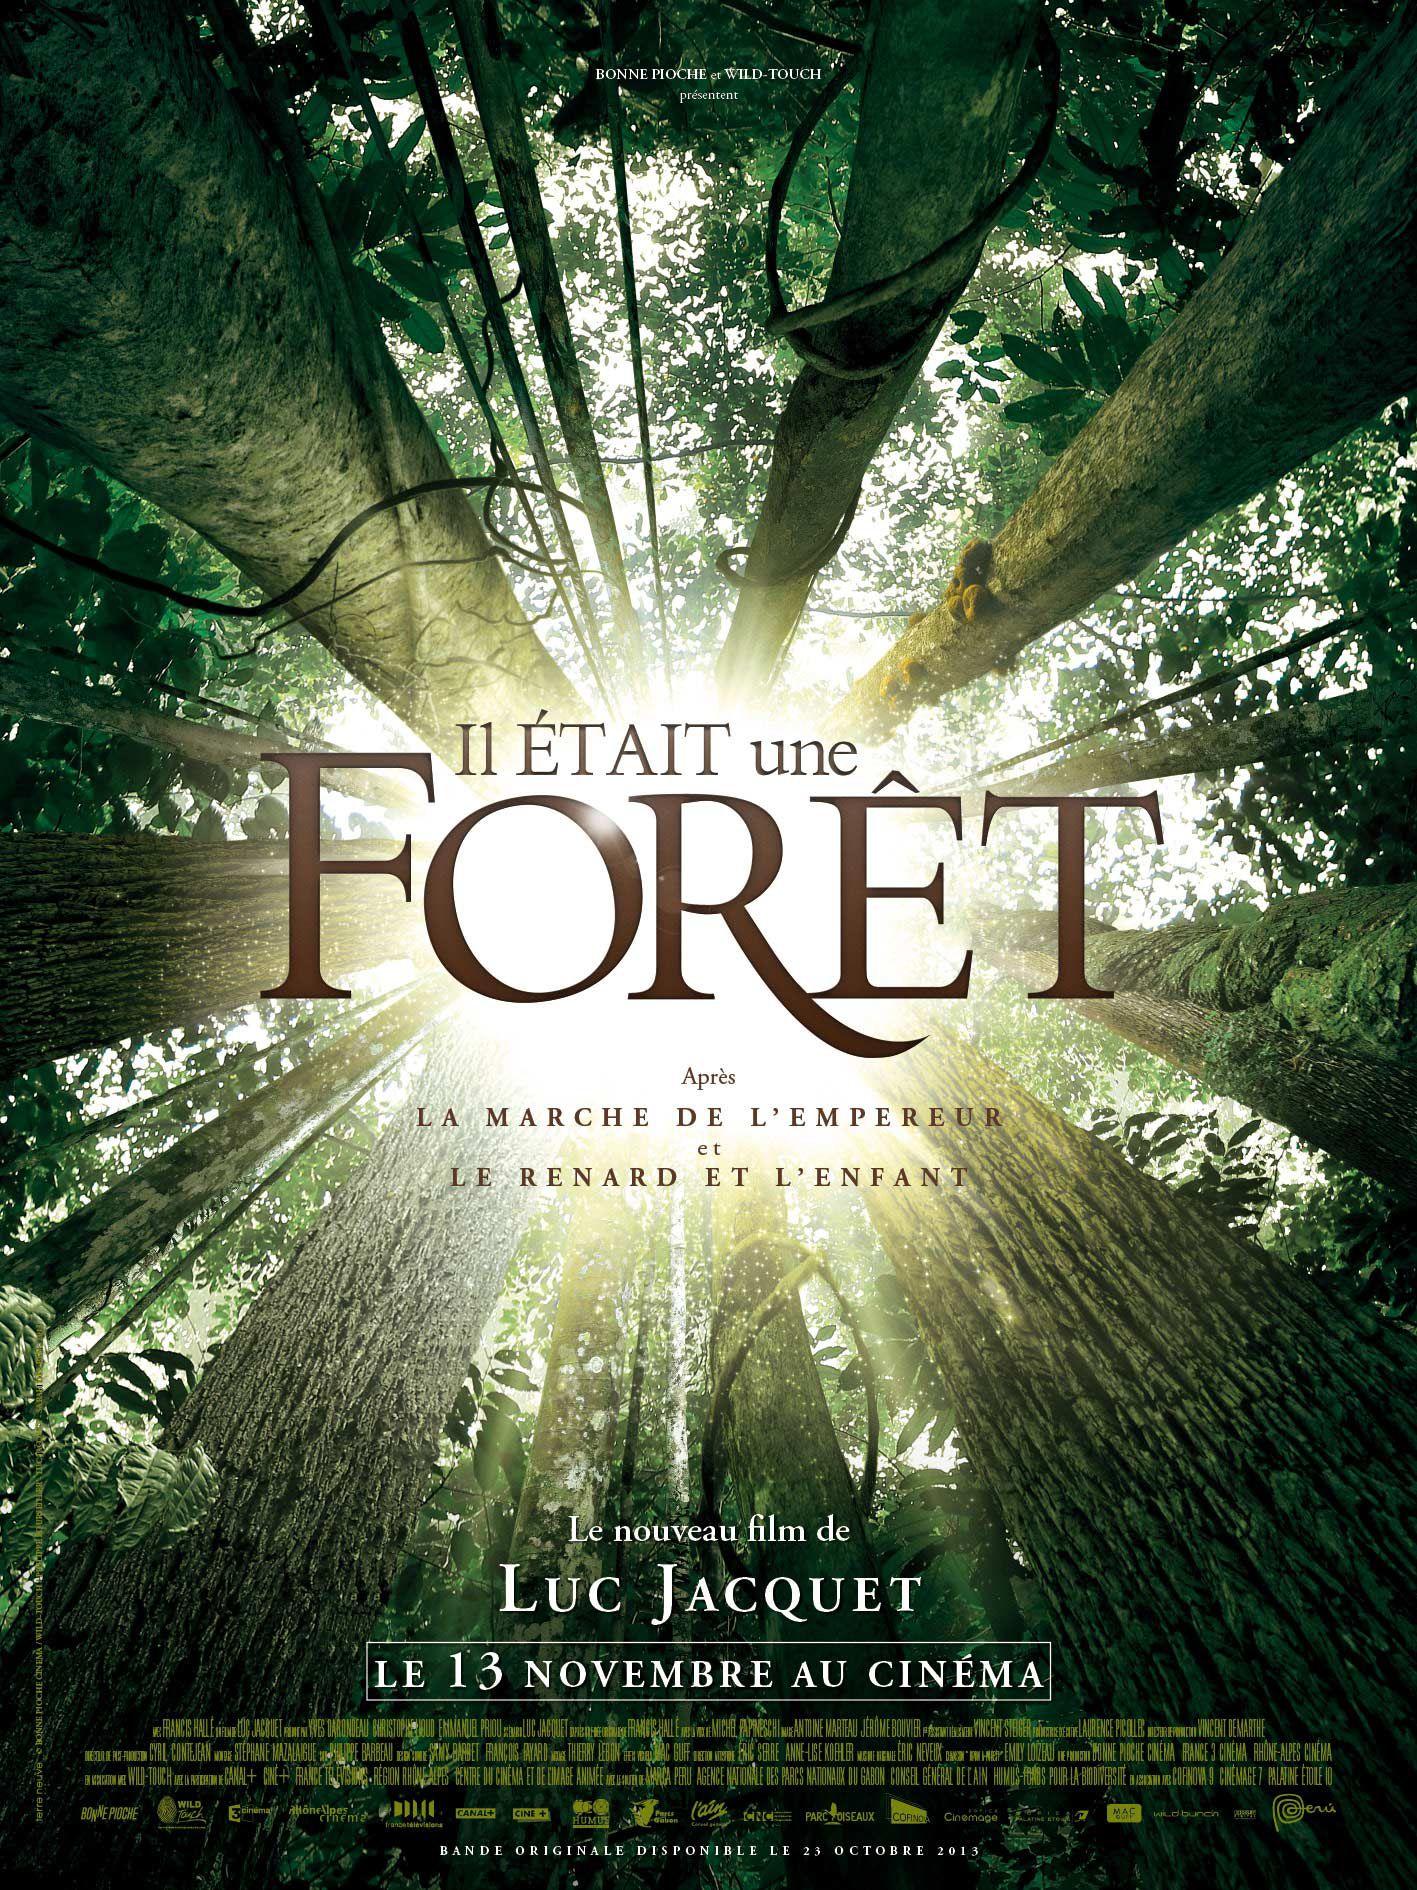 Affiche Poster Il était une forêt once upon a forest disney disneynature